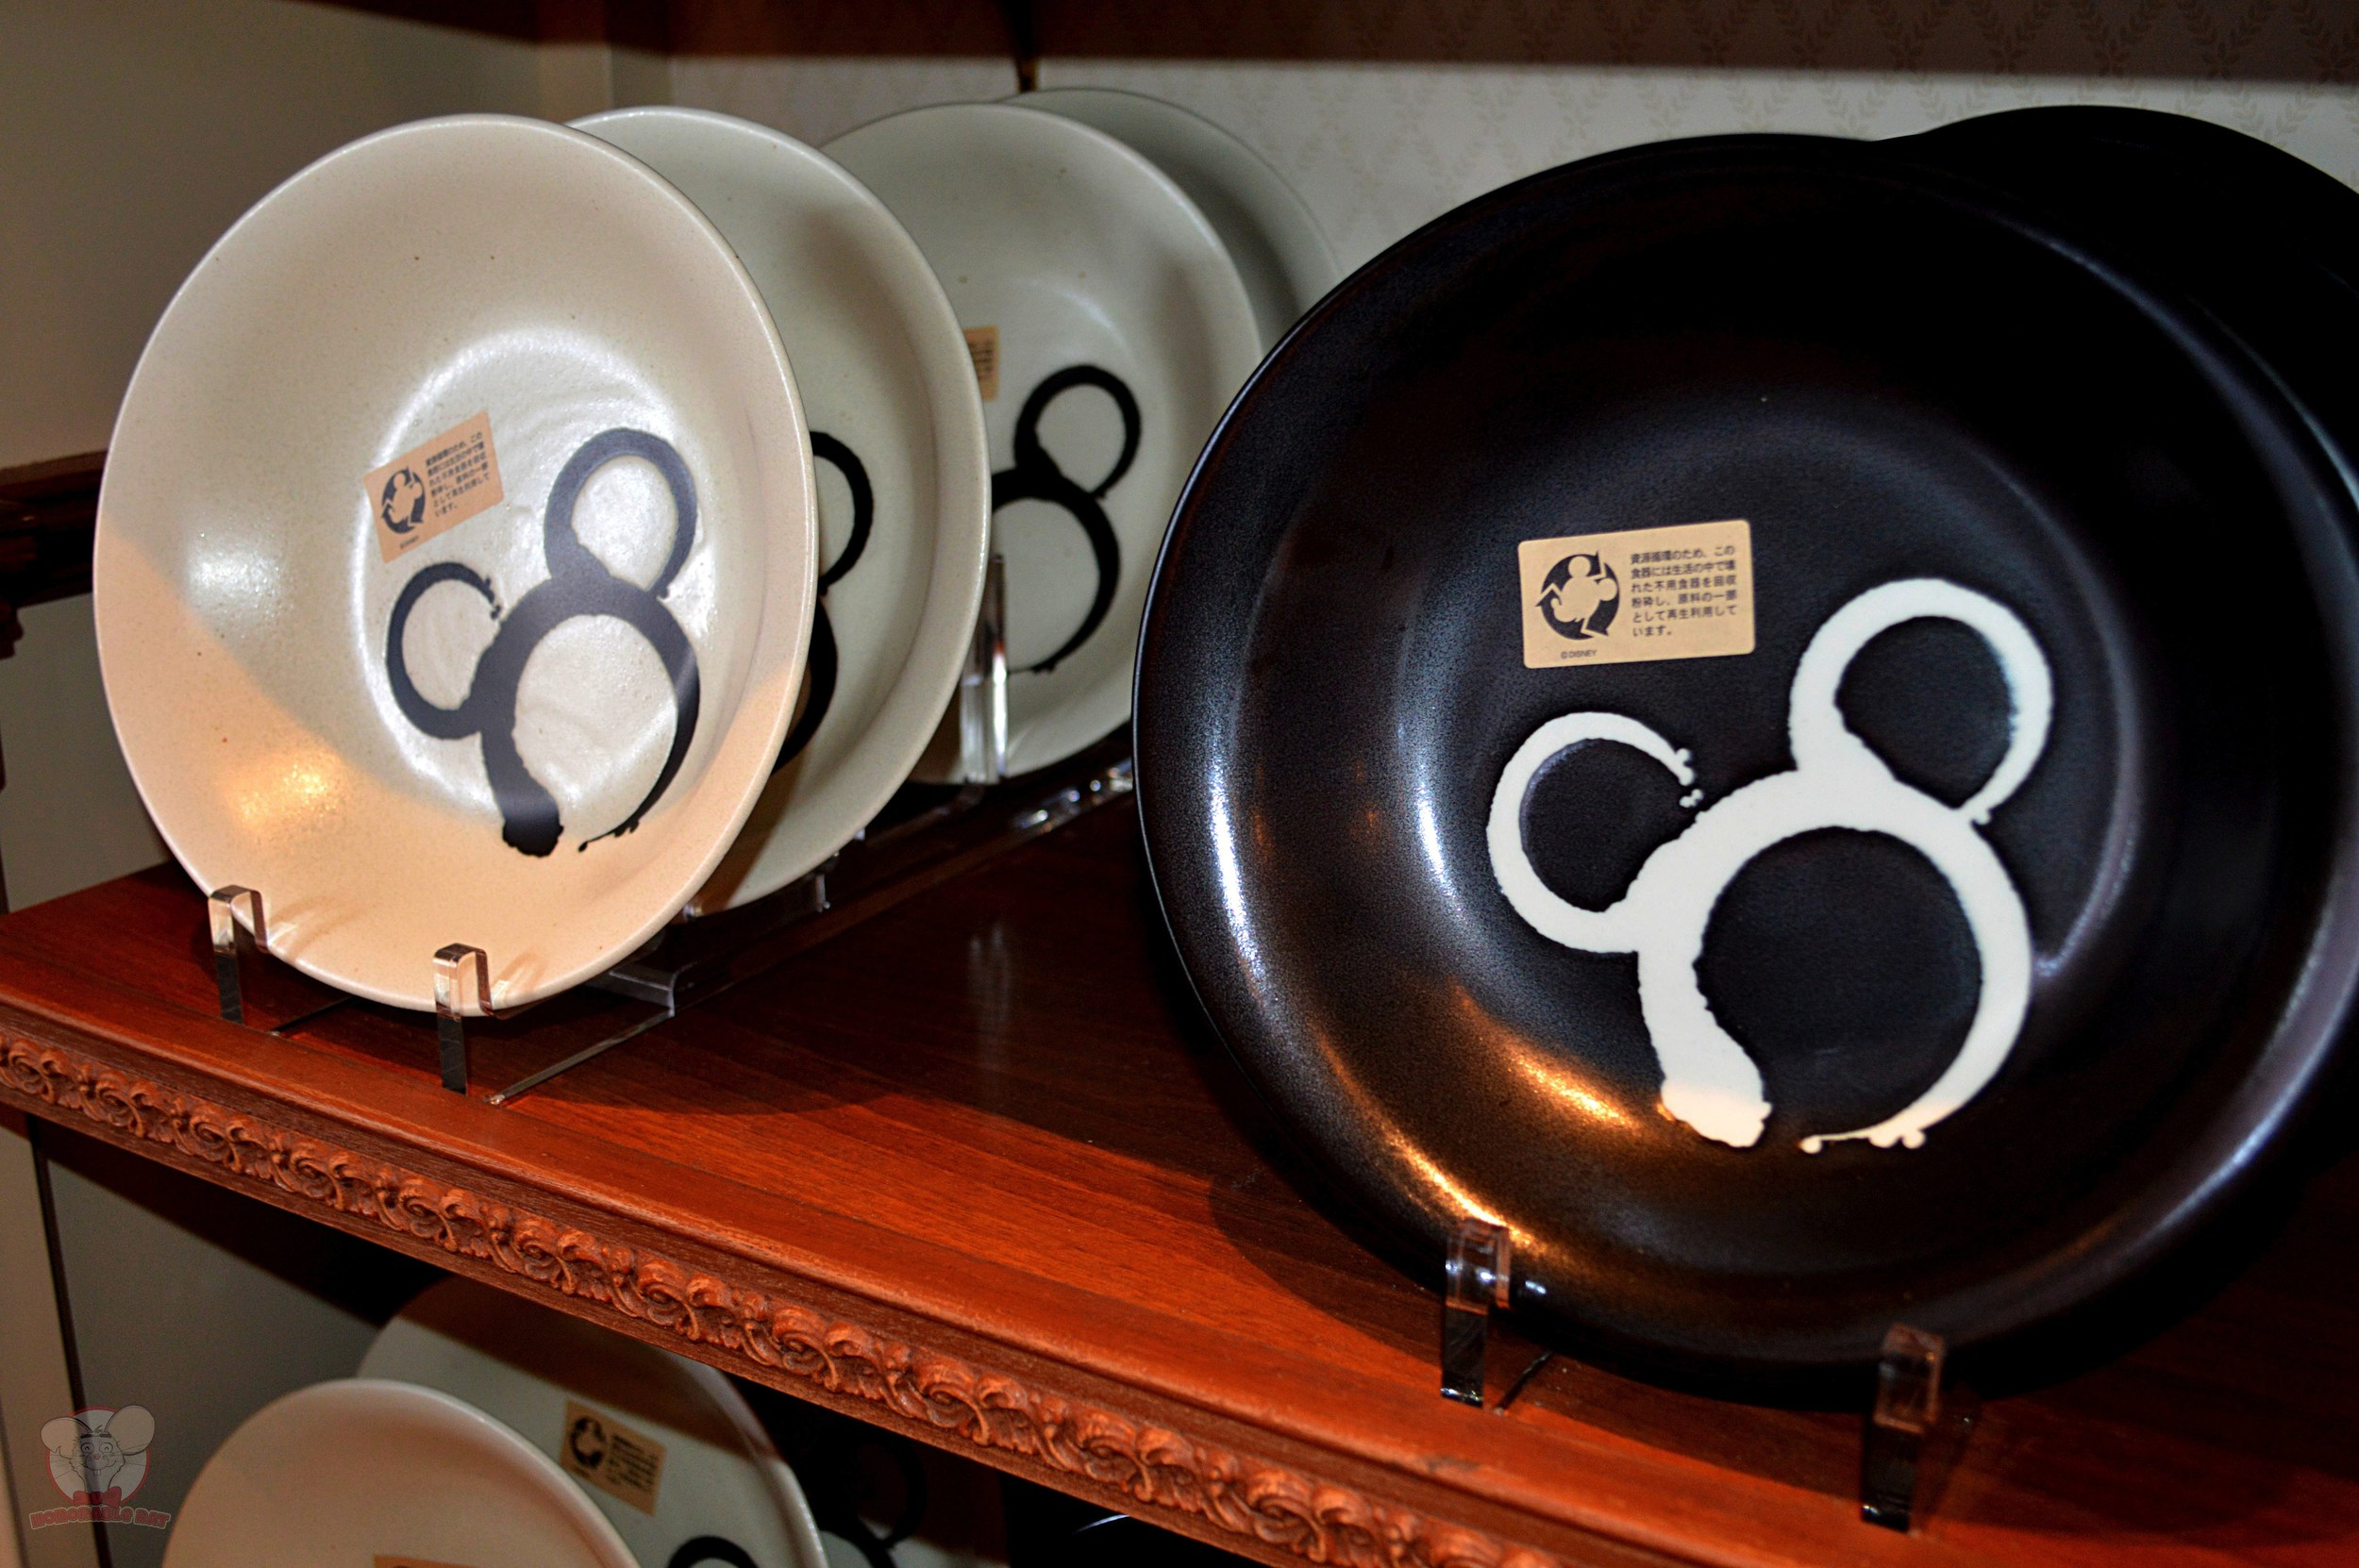 Mickey Japanese Plate: 1,700yen